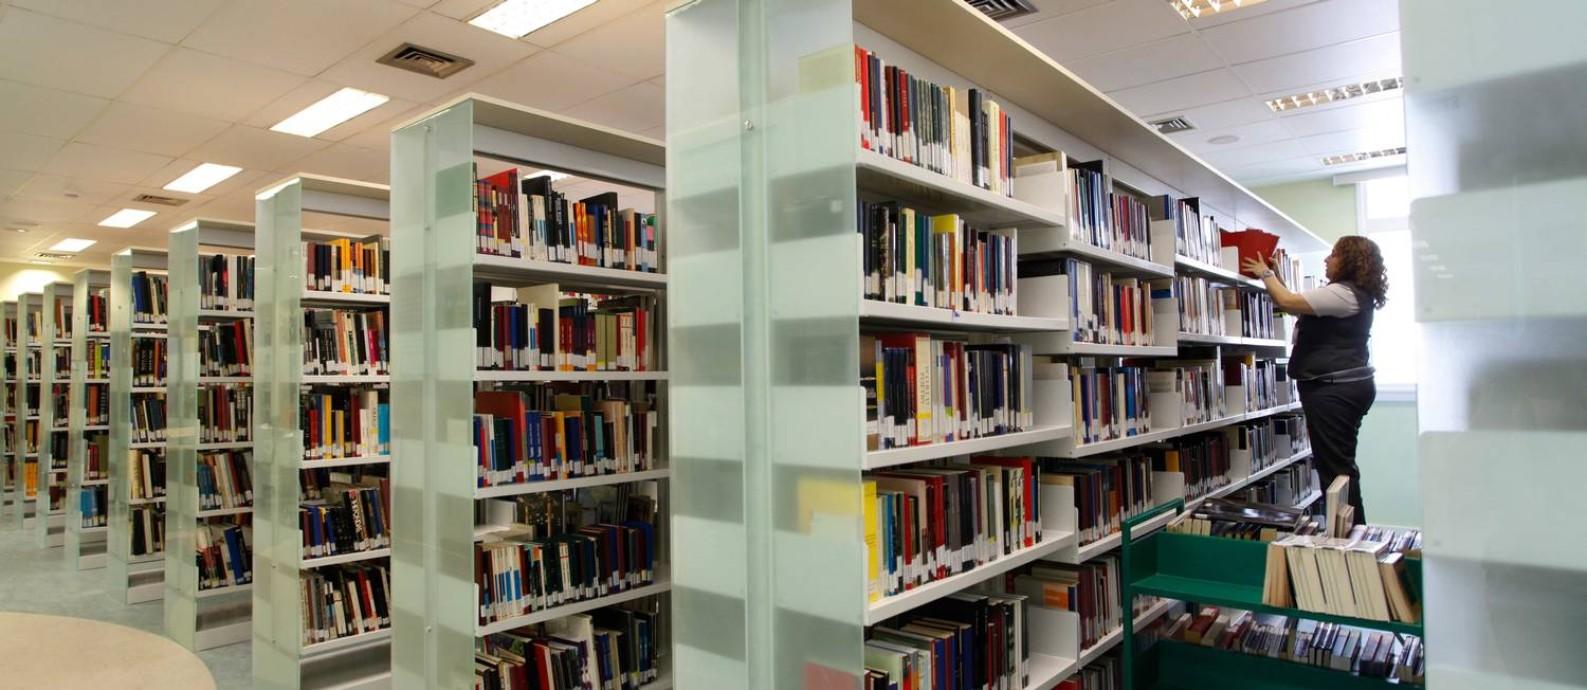 A biblioteca do Centro Cultural Banco do Brasil (CCBB), reabrirá após dois meses fechada Foto: Ana Branco / O Globo